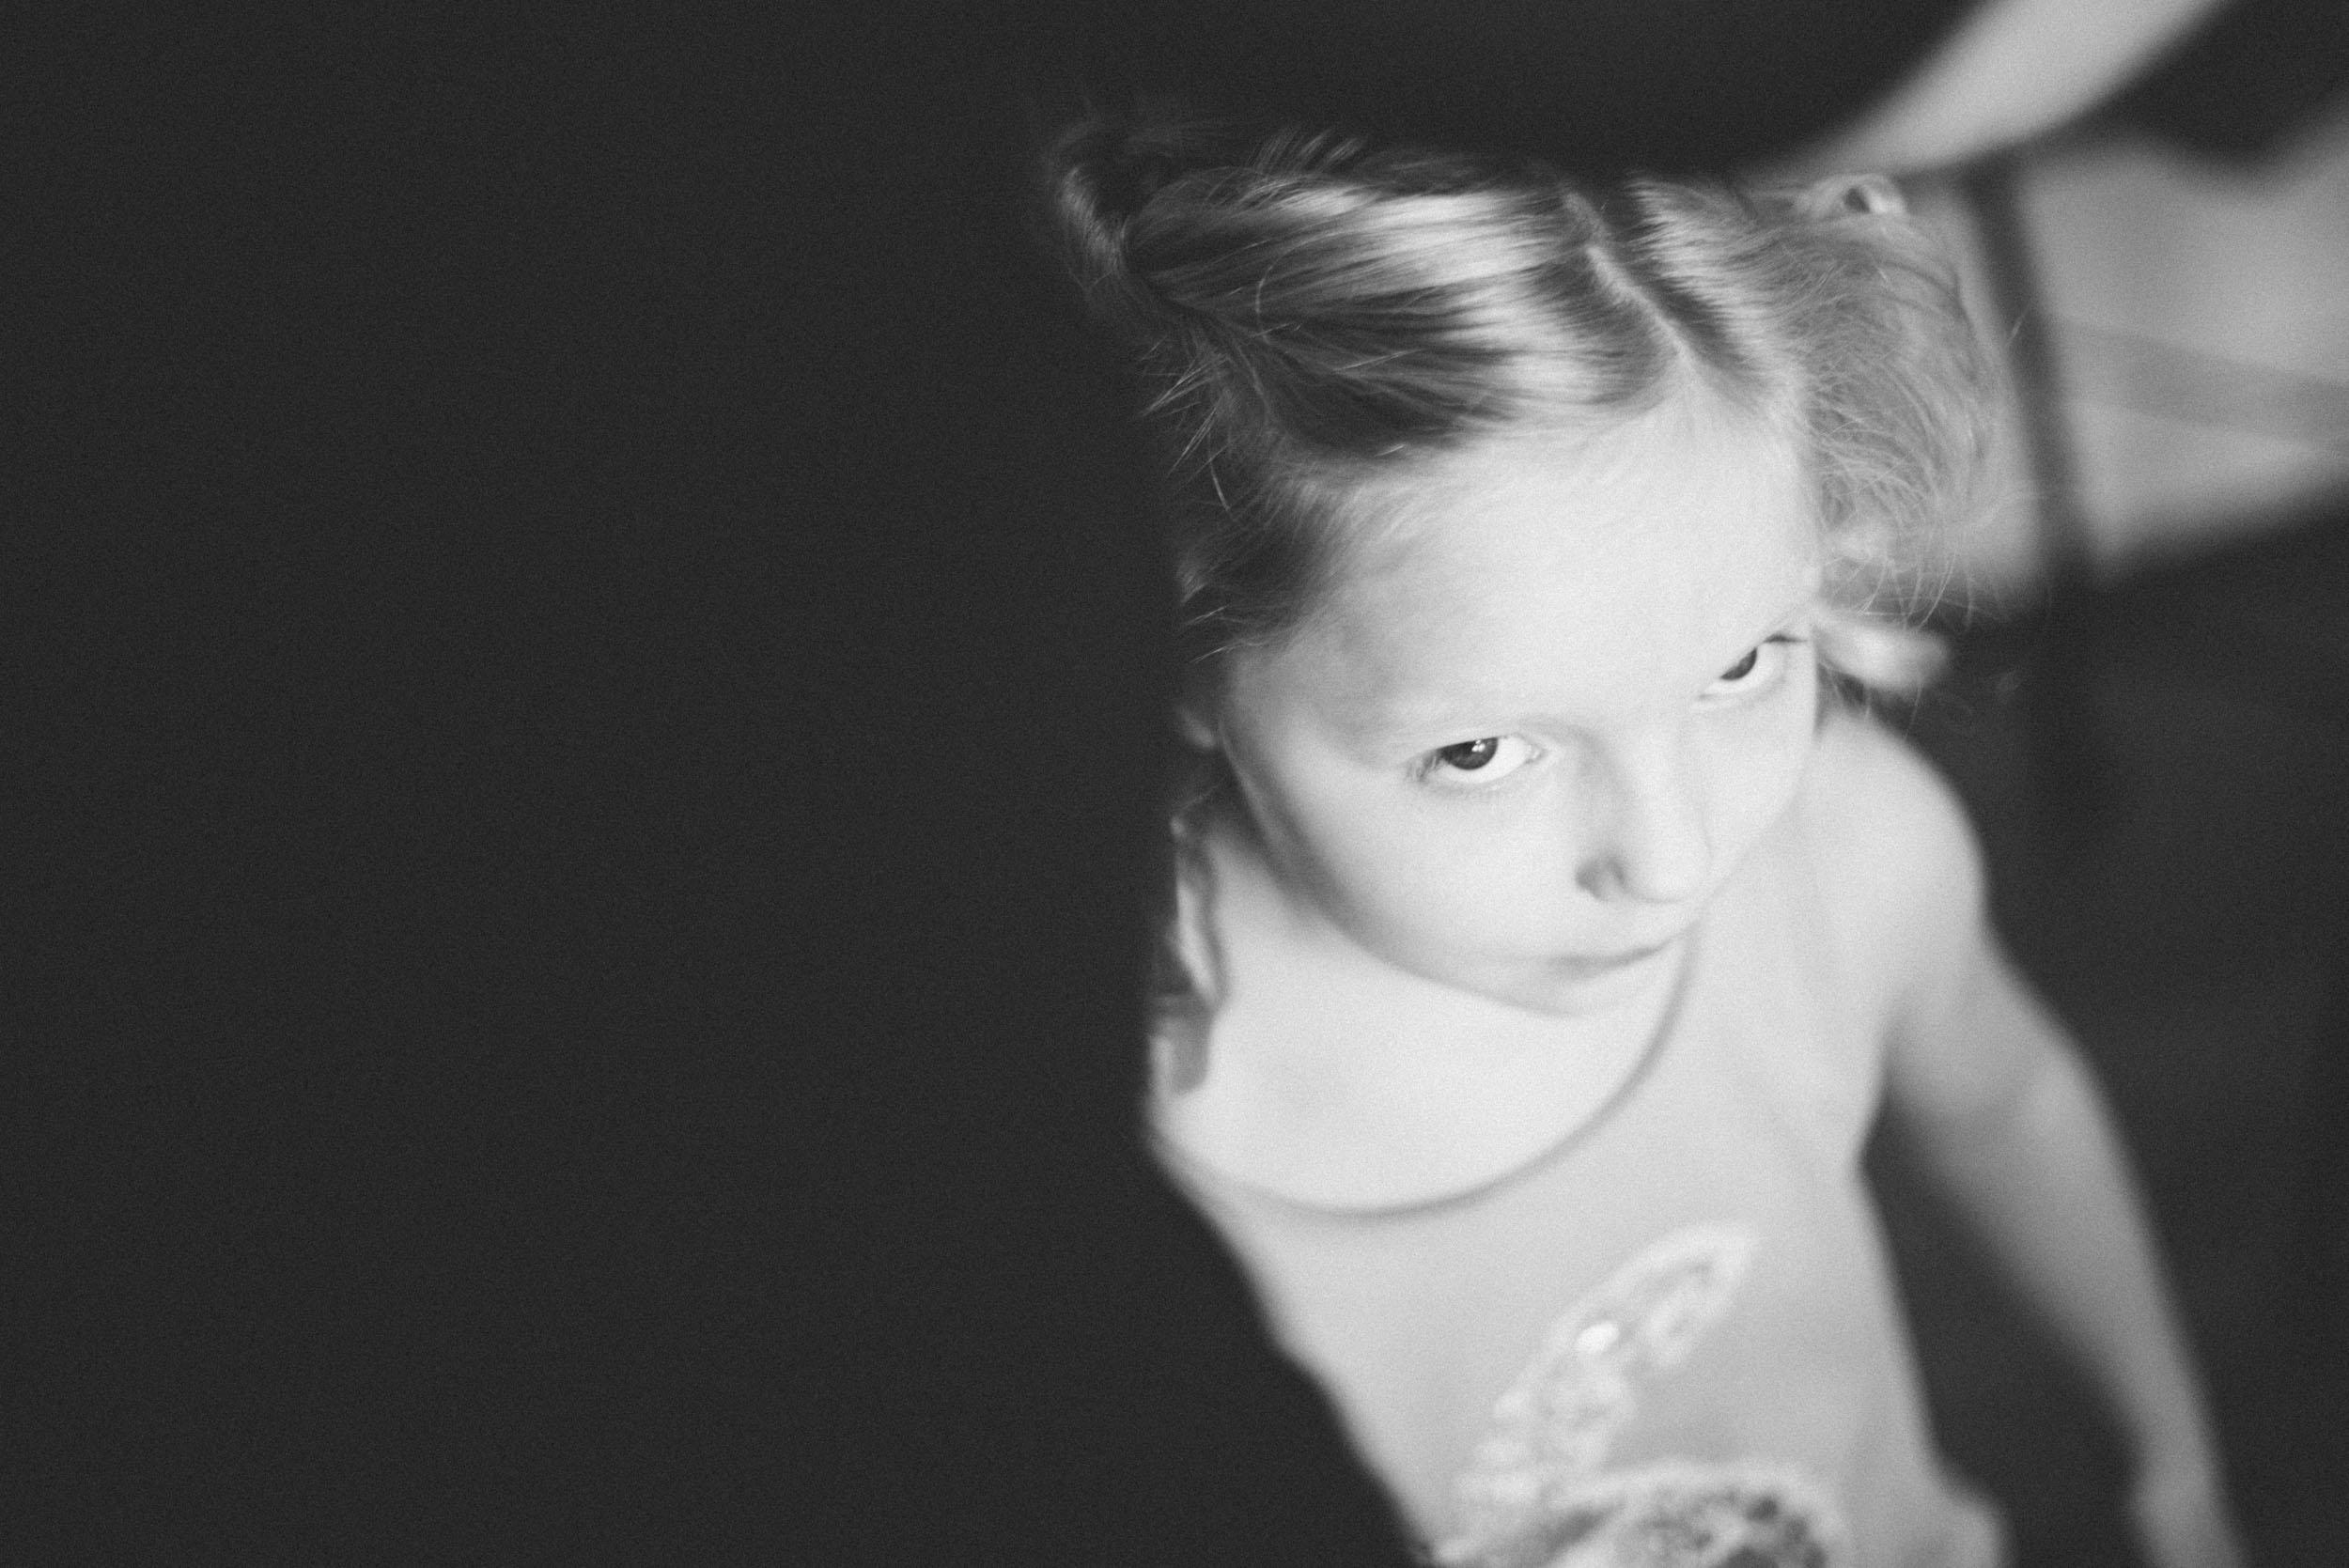 Gaie-Lea-Staunton-weddding-photographer-21.jpg